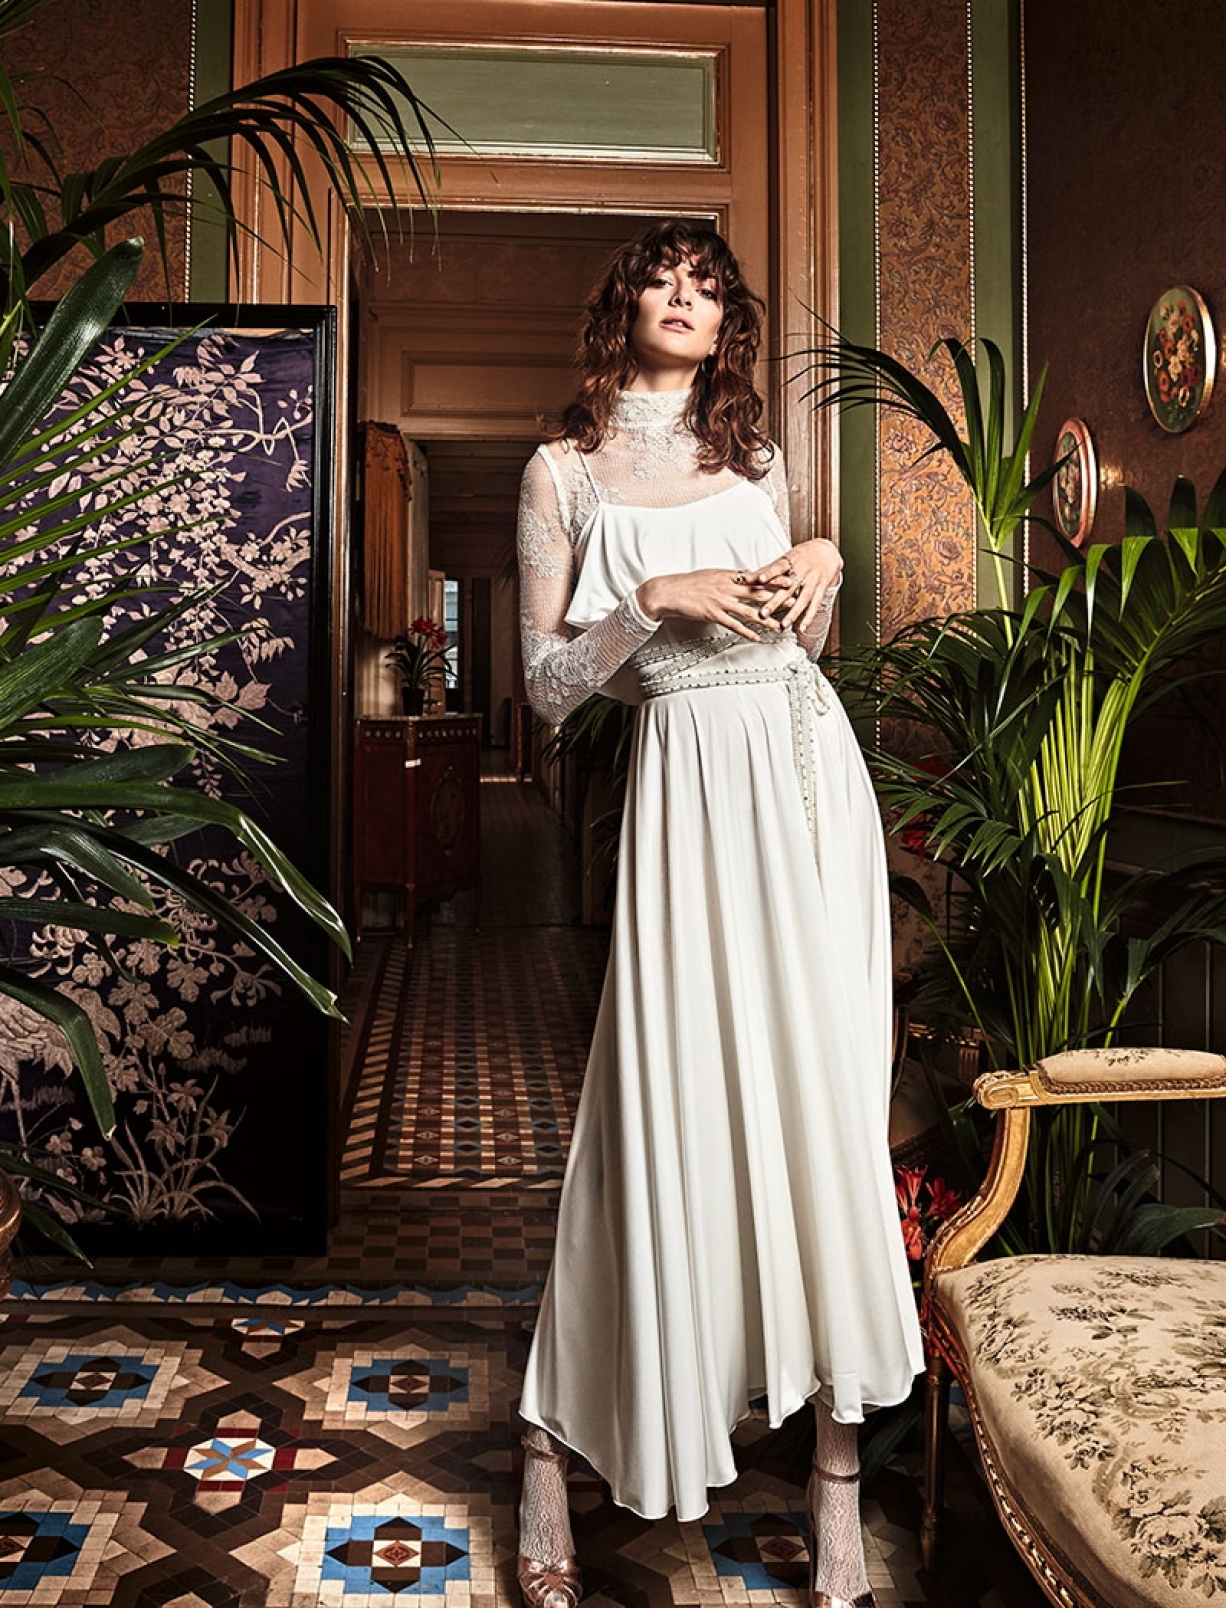 boho_chic_wedding_dresses_2017_bohemian_lace_wedding_dress_yolan_cris_chris_style_tamarindo-2.jpg